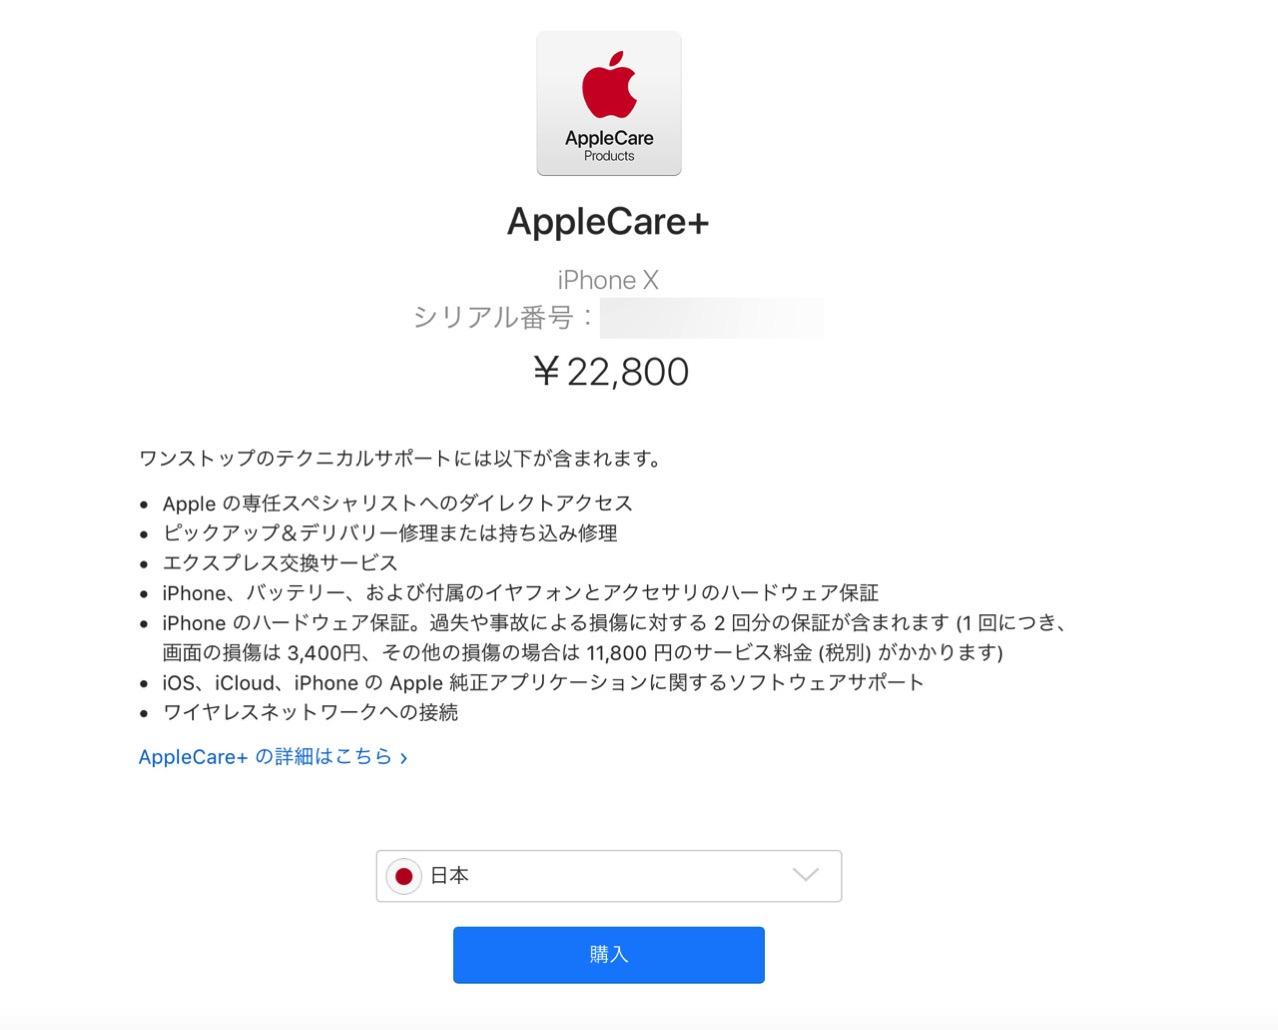 iPhone本体のシリアル番号を確認